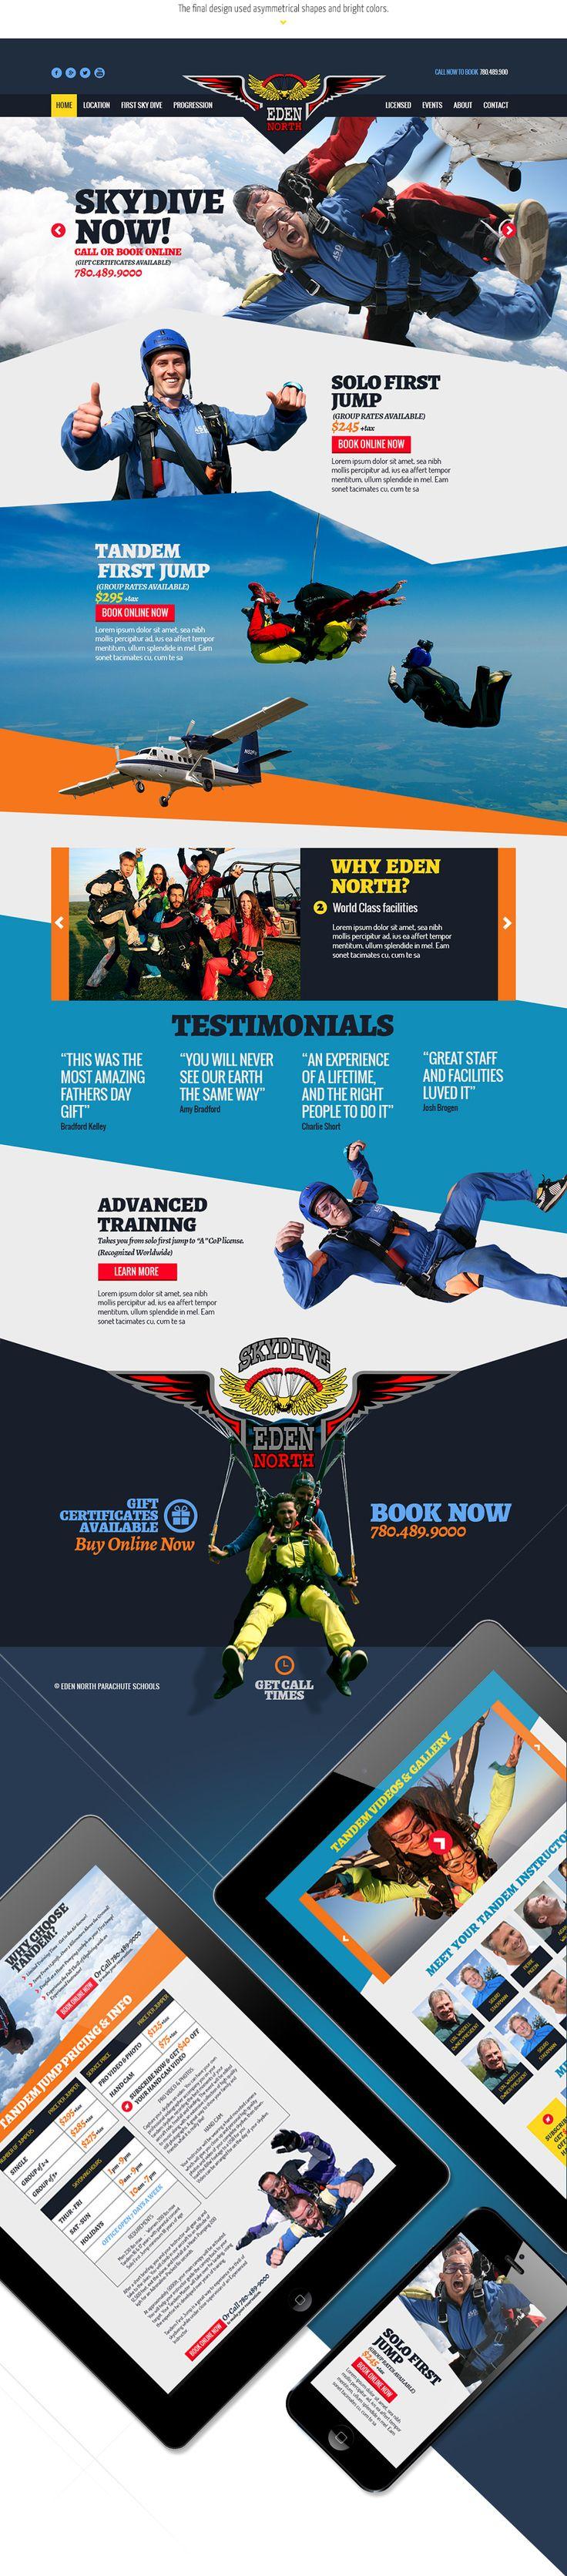 Eden North Skydiving Website Design Joseph Kiely